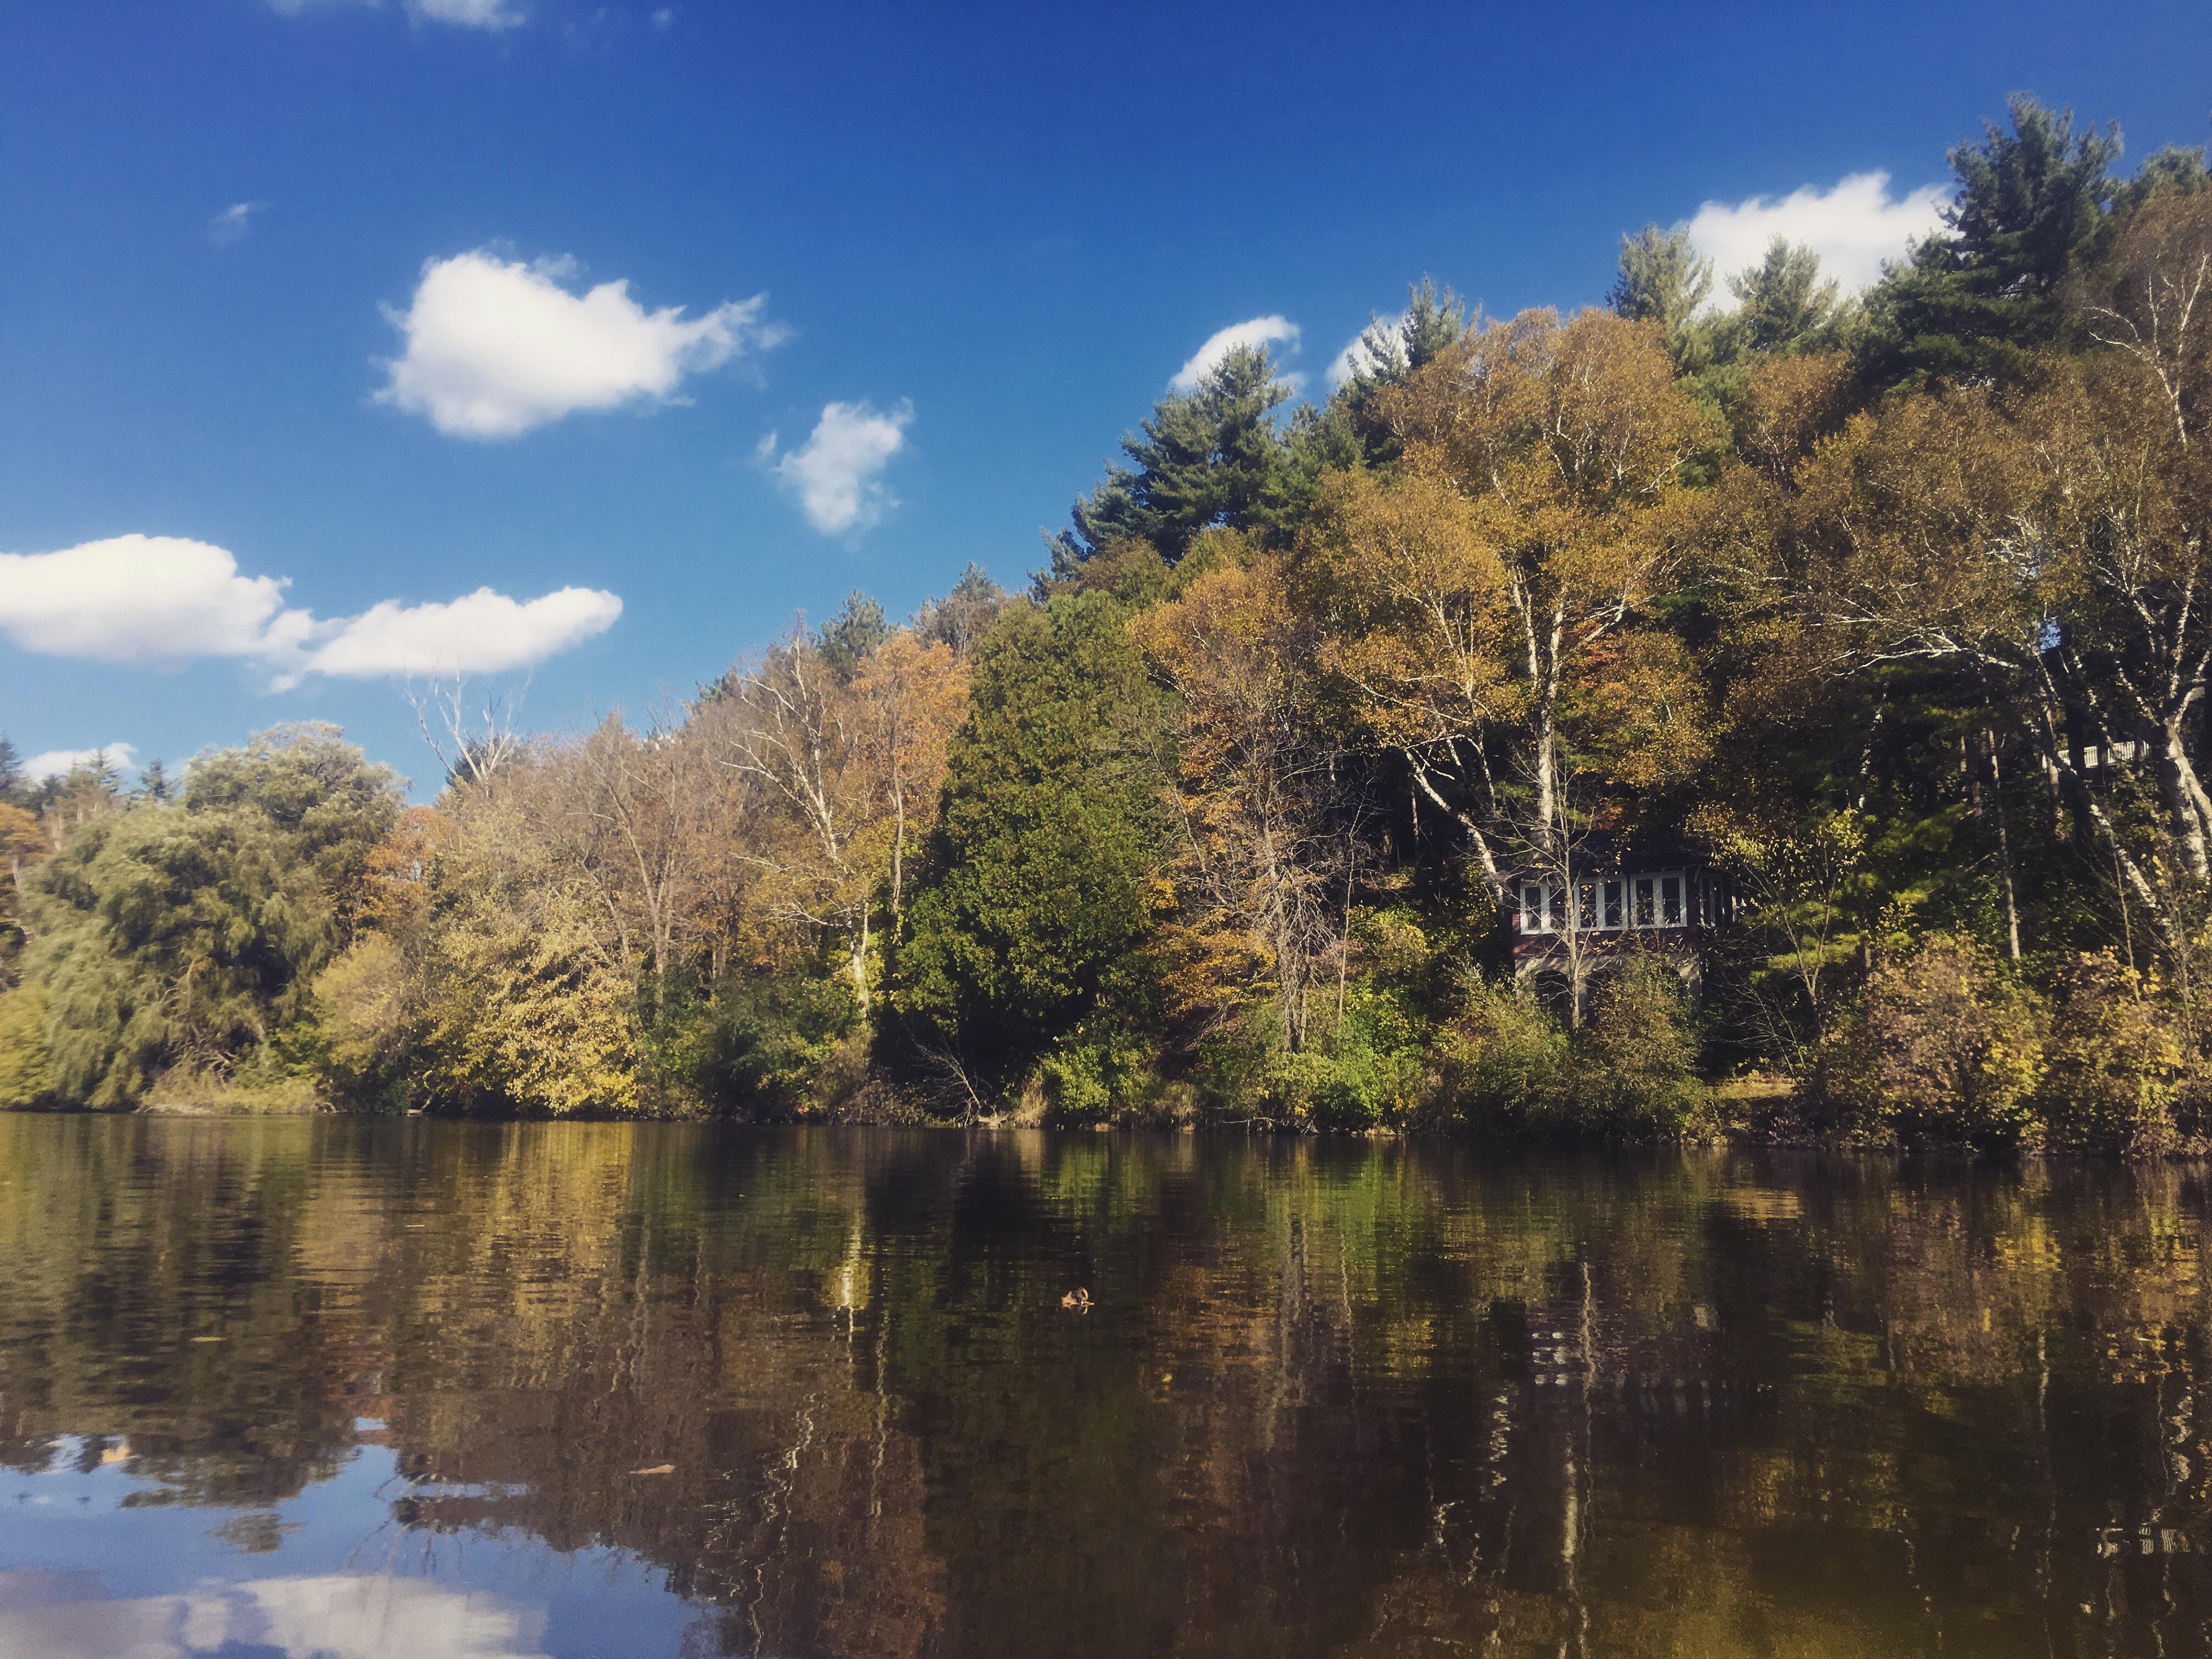 River Island Park